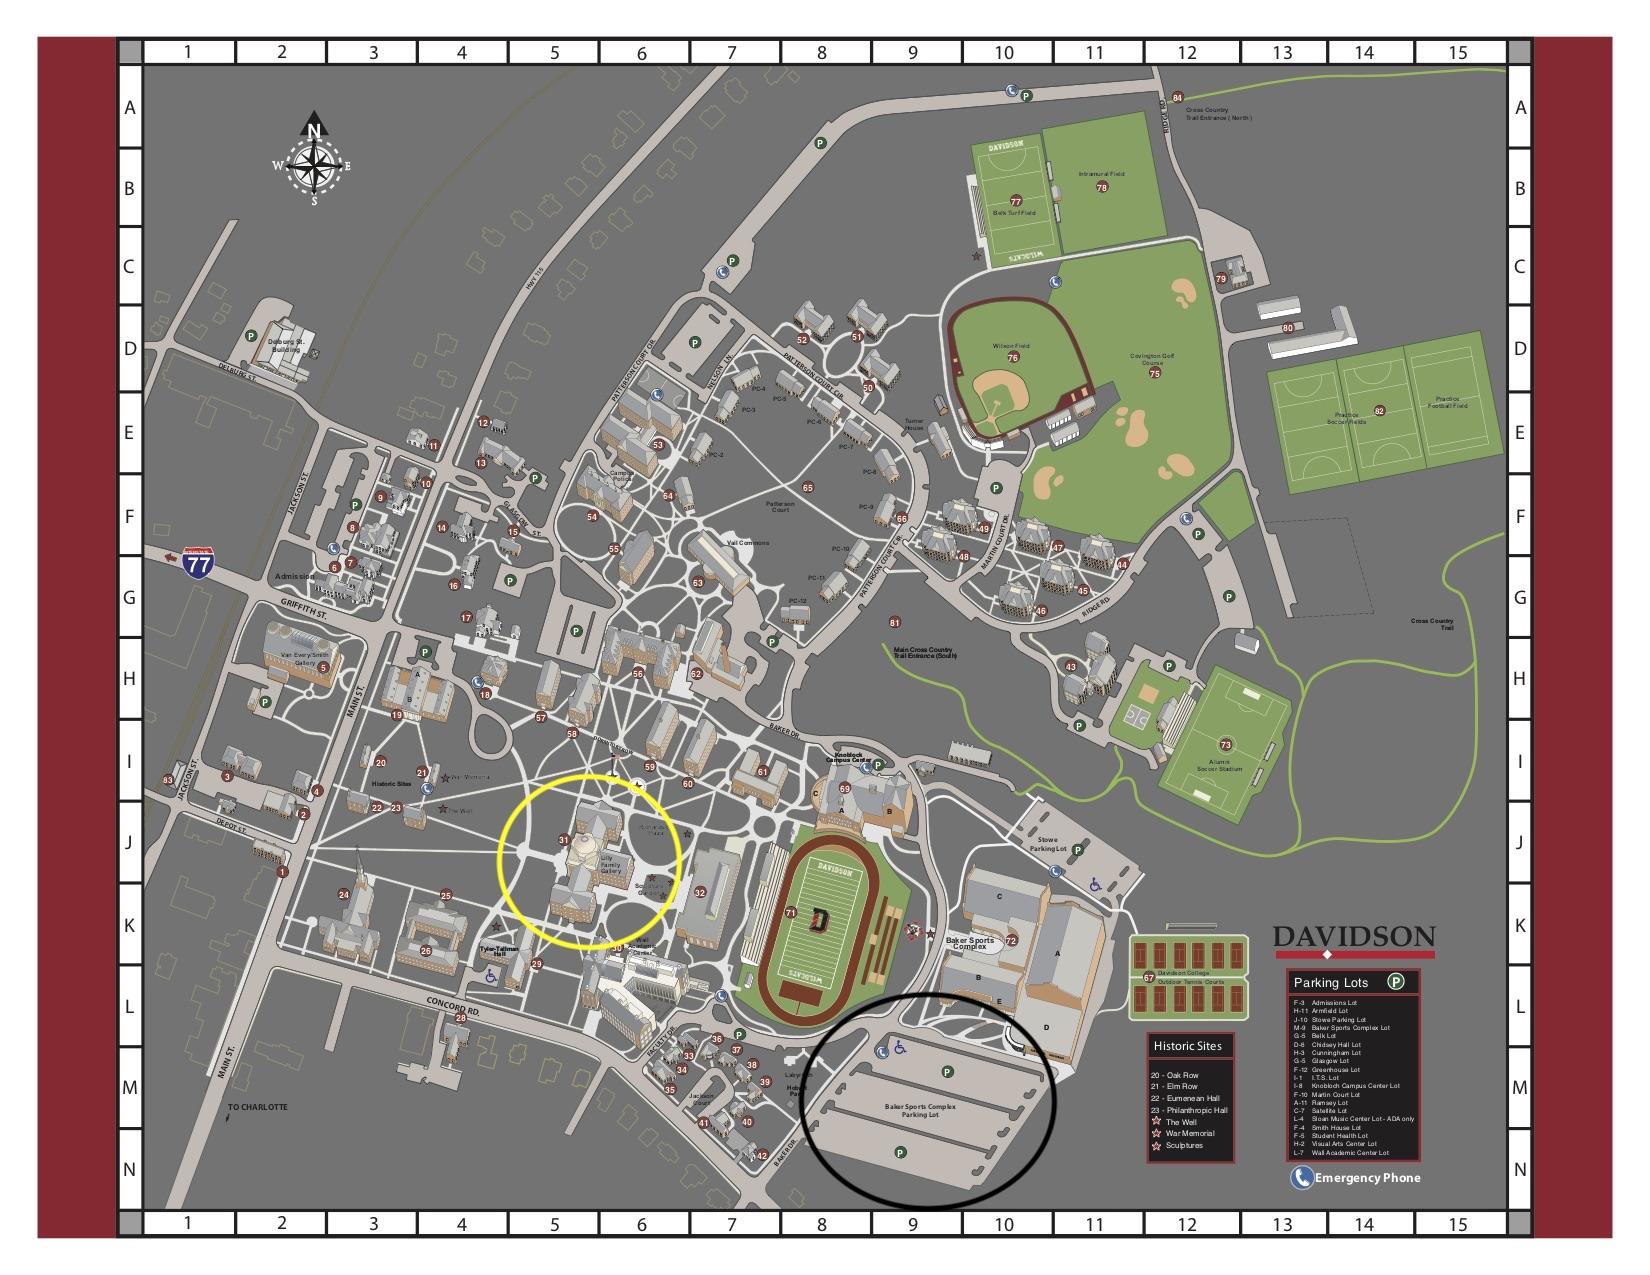 campus-map-8-5x11-1-2.jpg